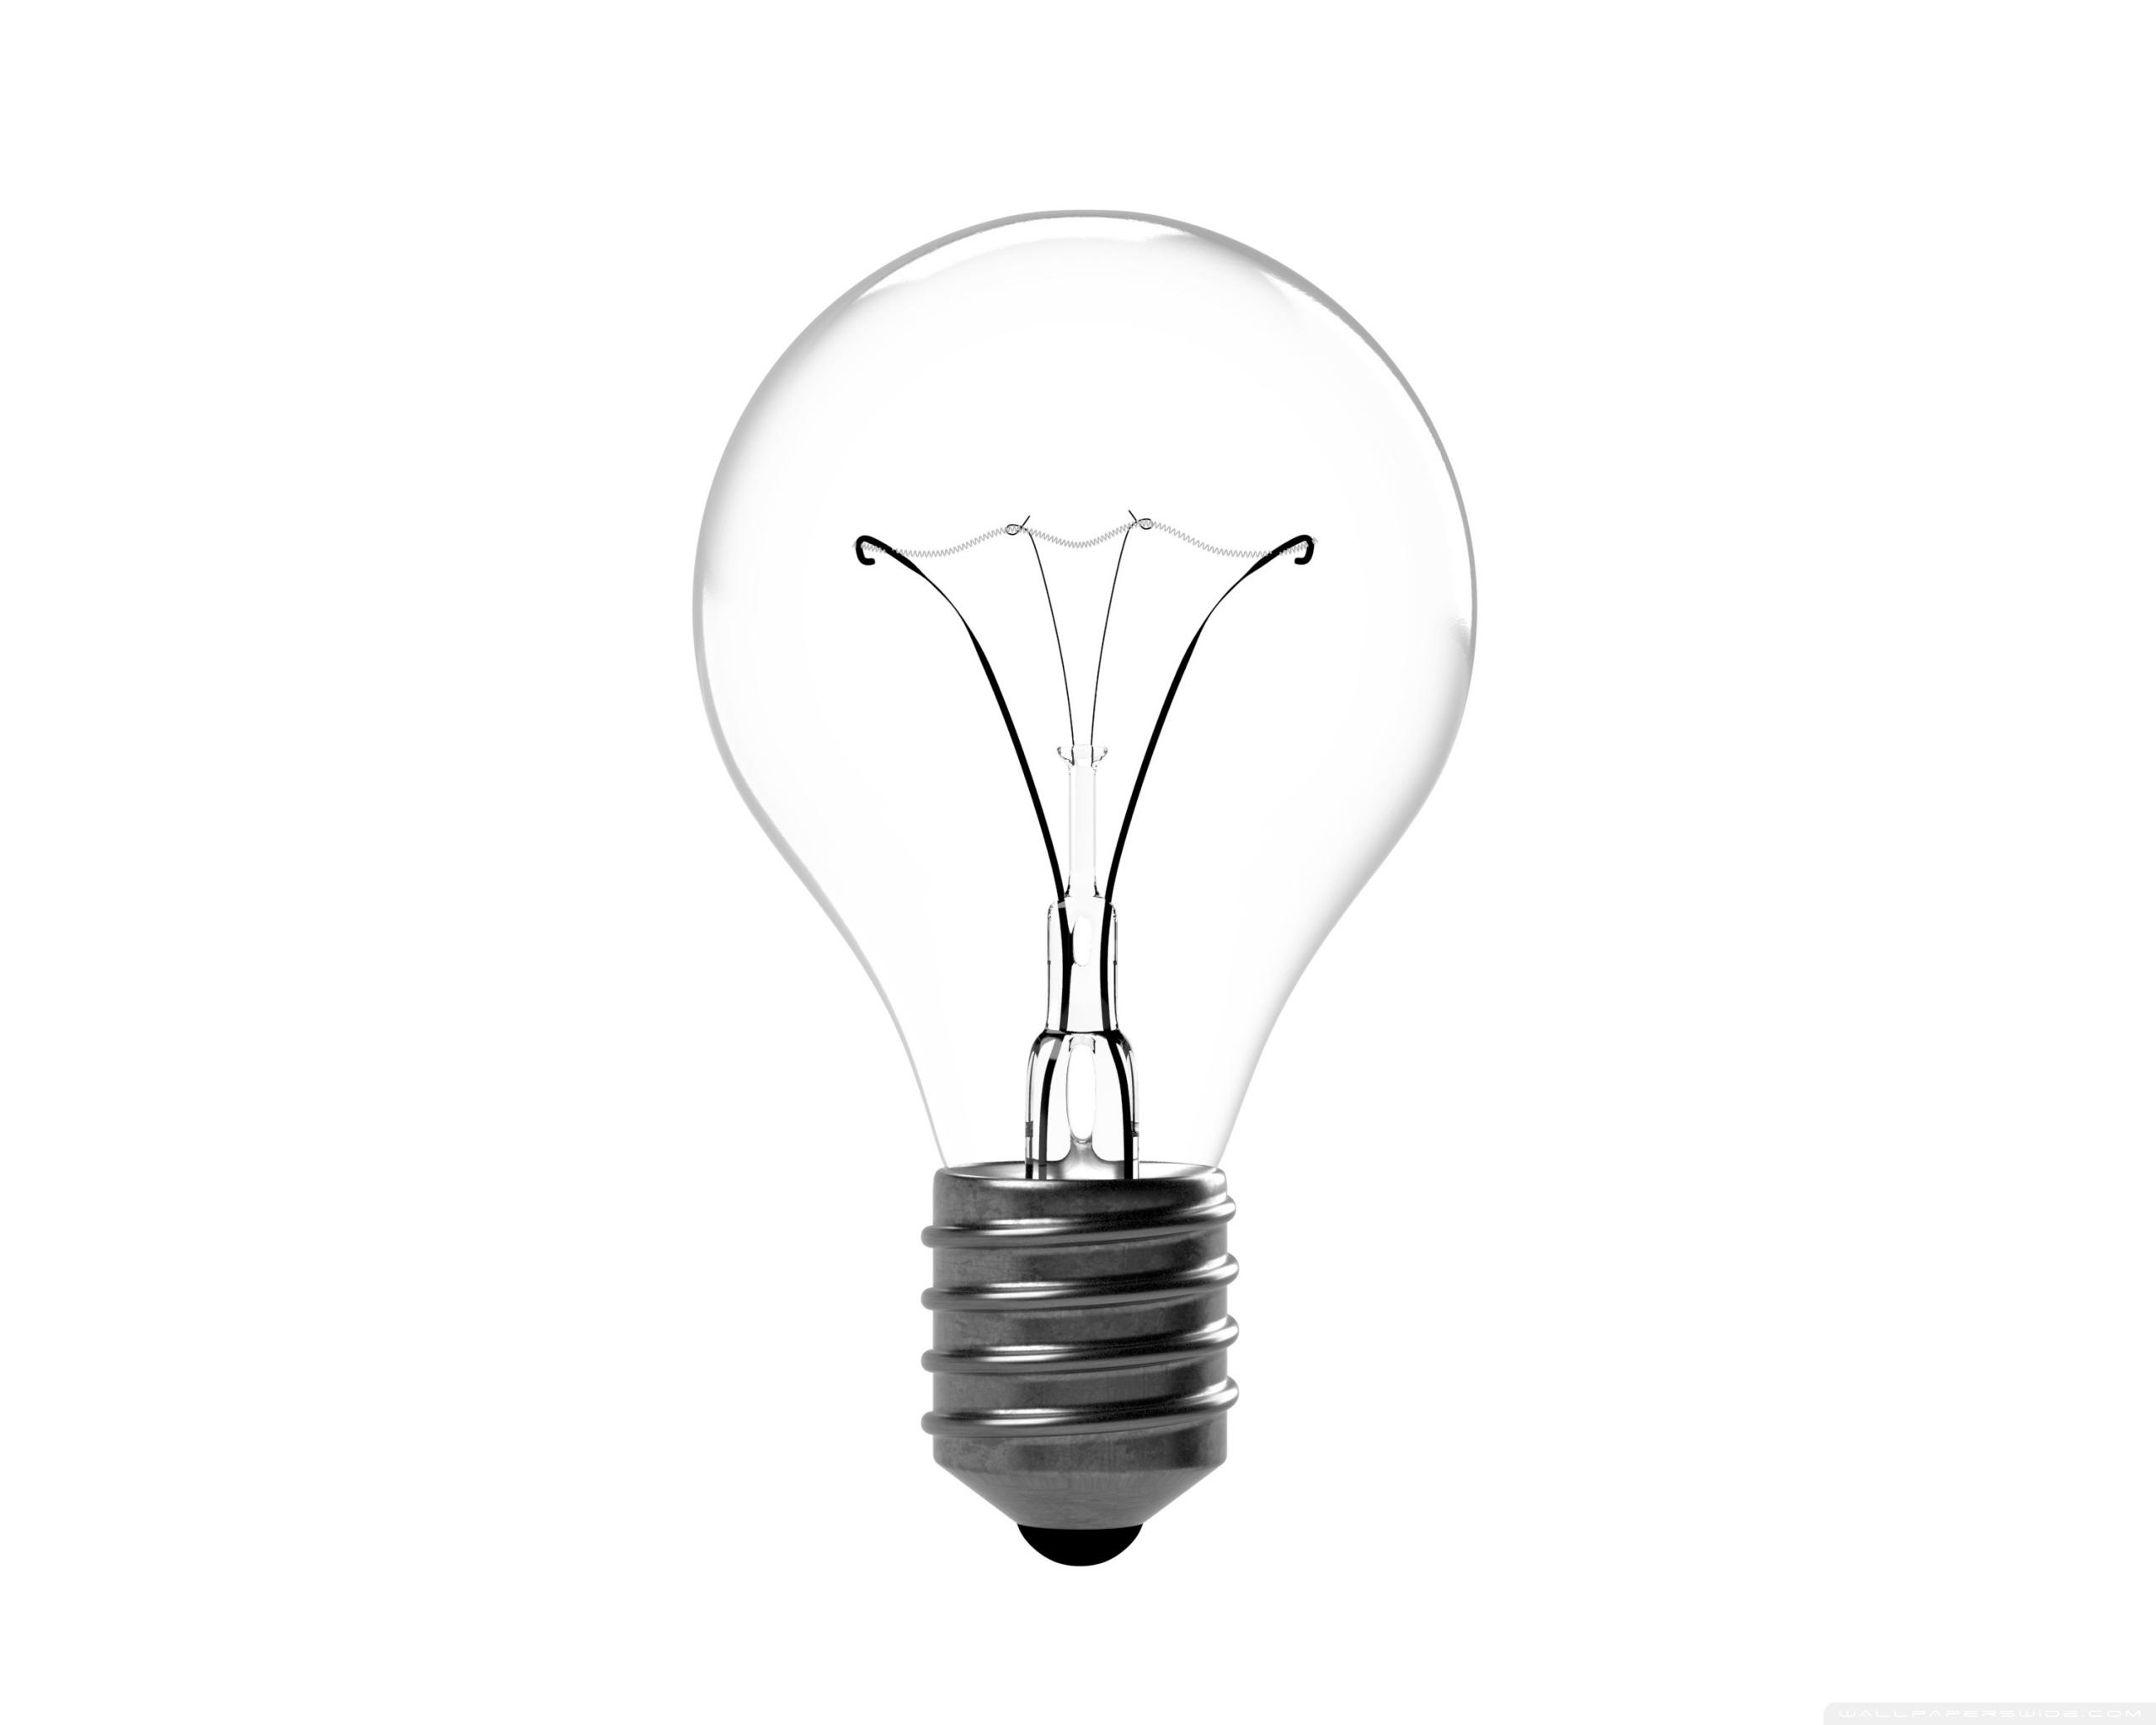 Incandescent Light Bulb 4k Hd Desktop Wallpaper For 4k